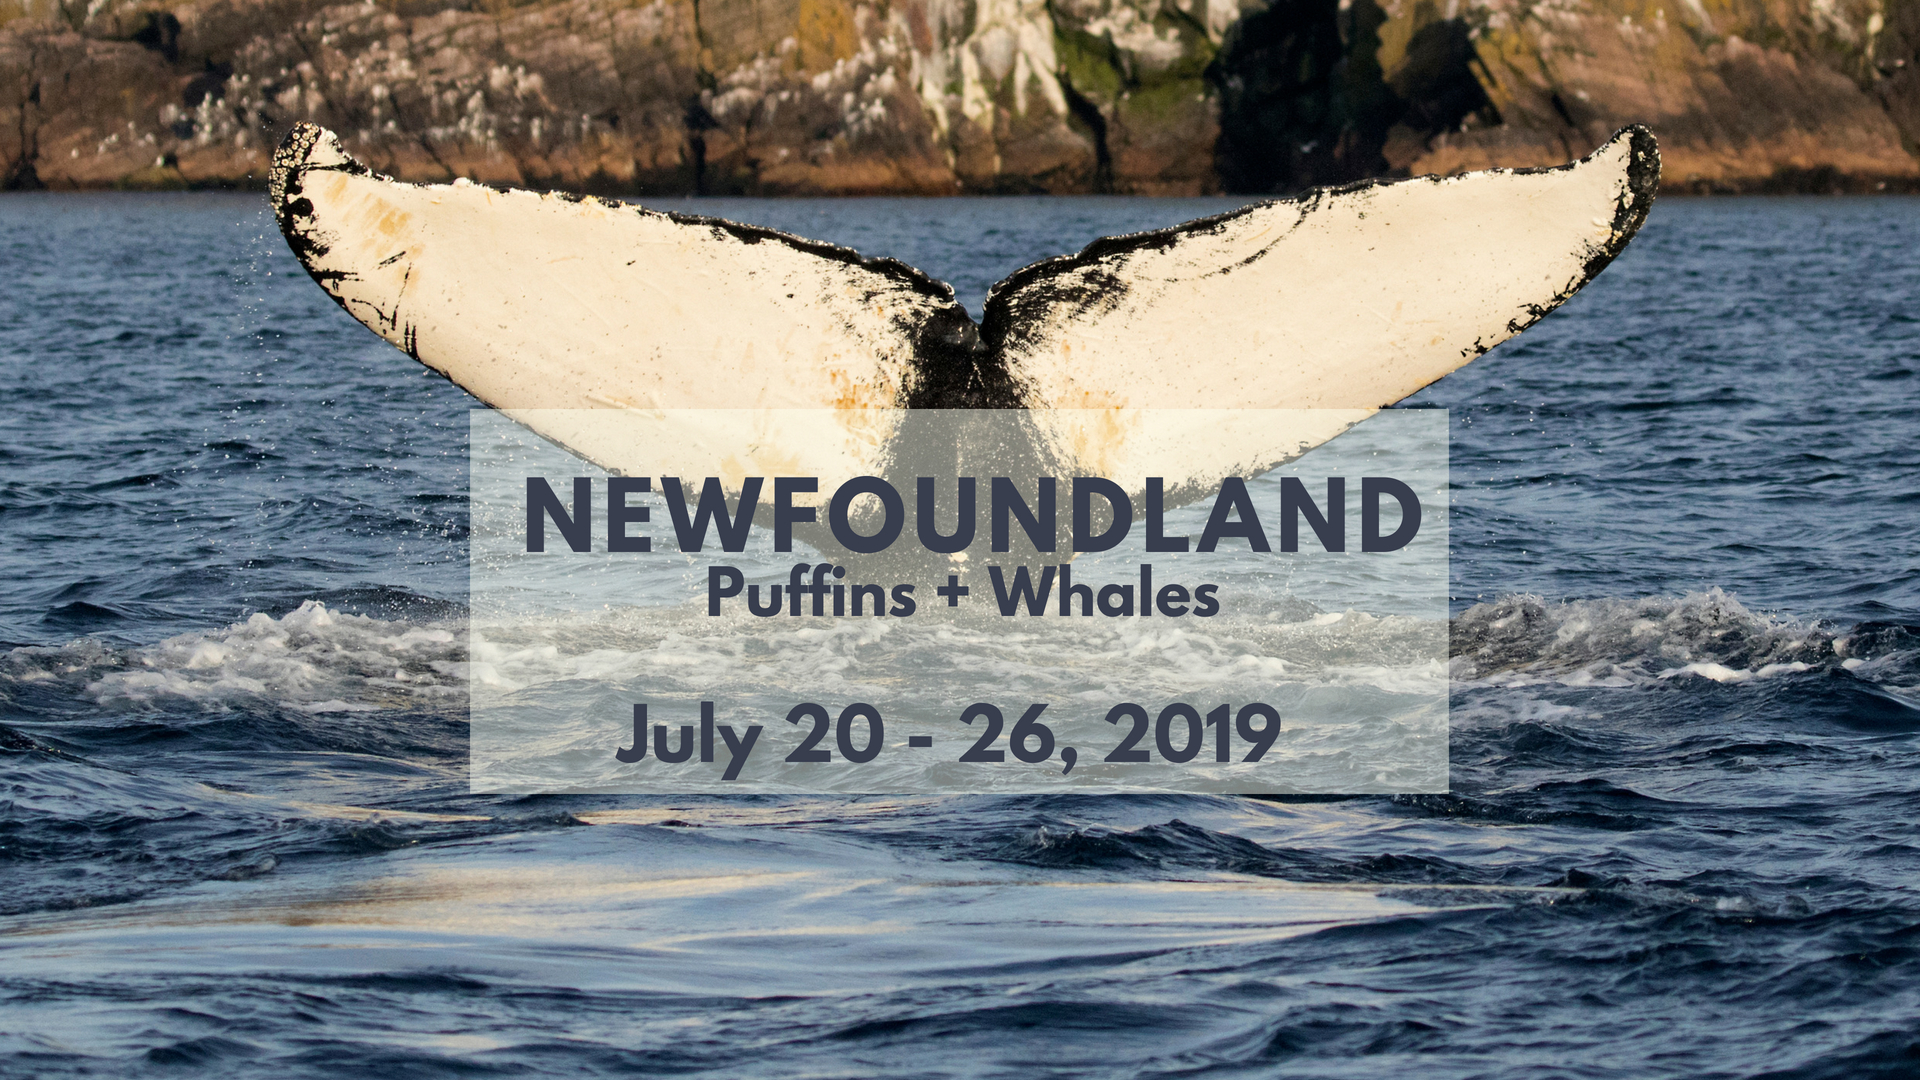 Newfoundland Photography Workshop 2019 - North of 49 Photography